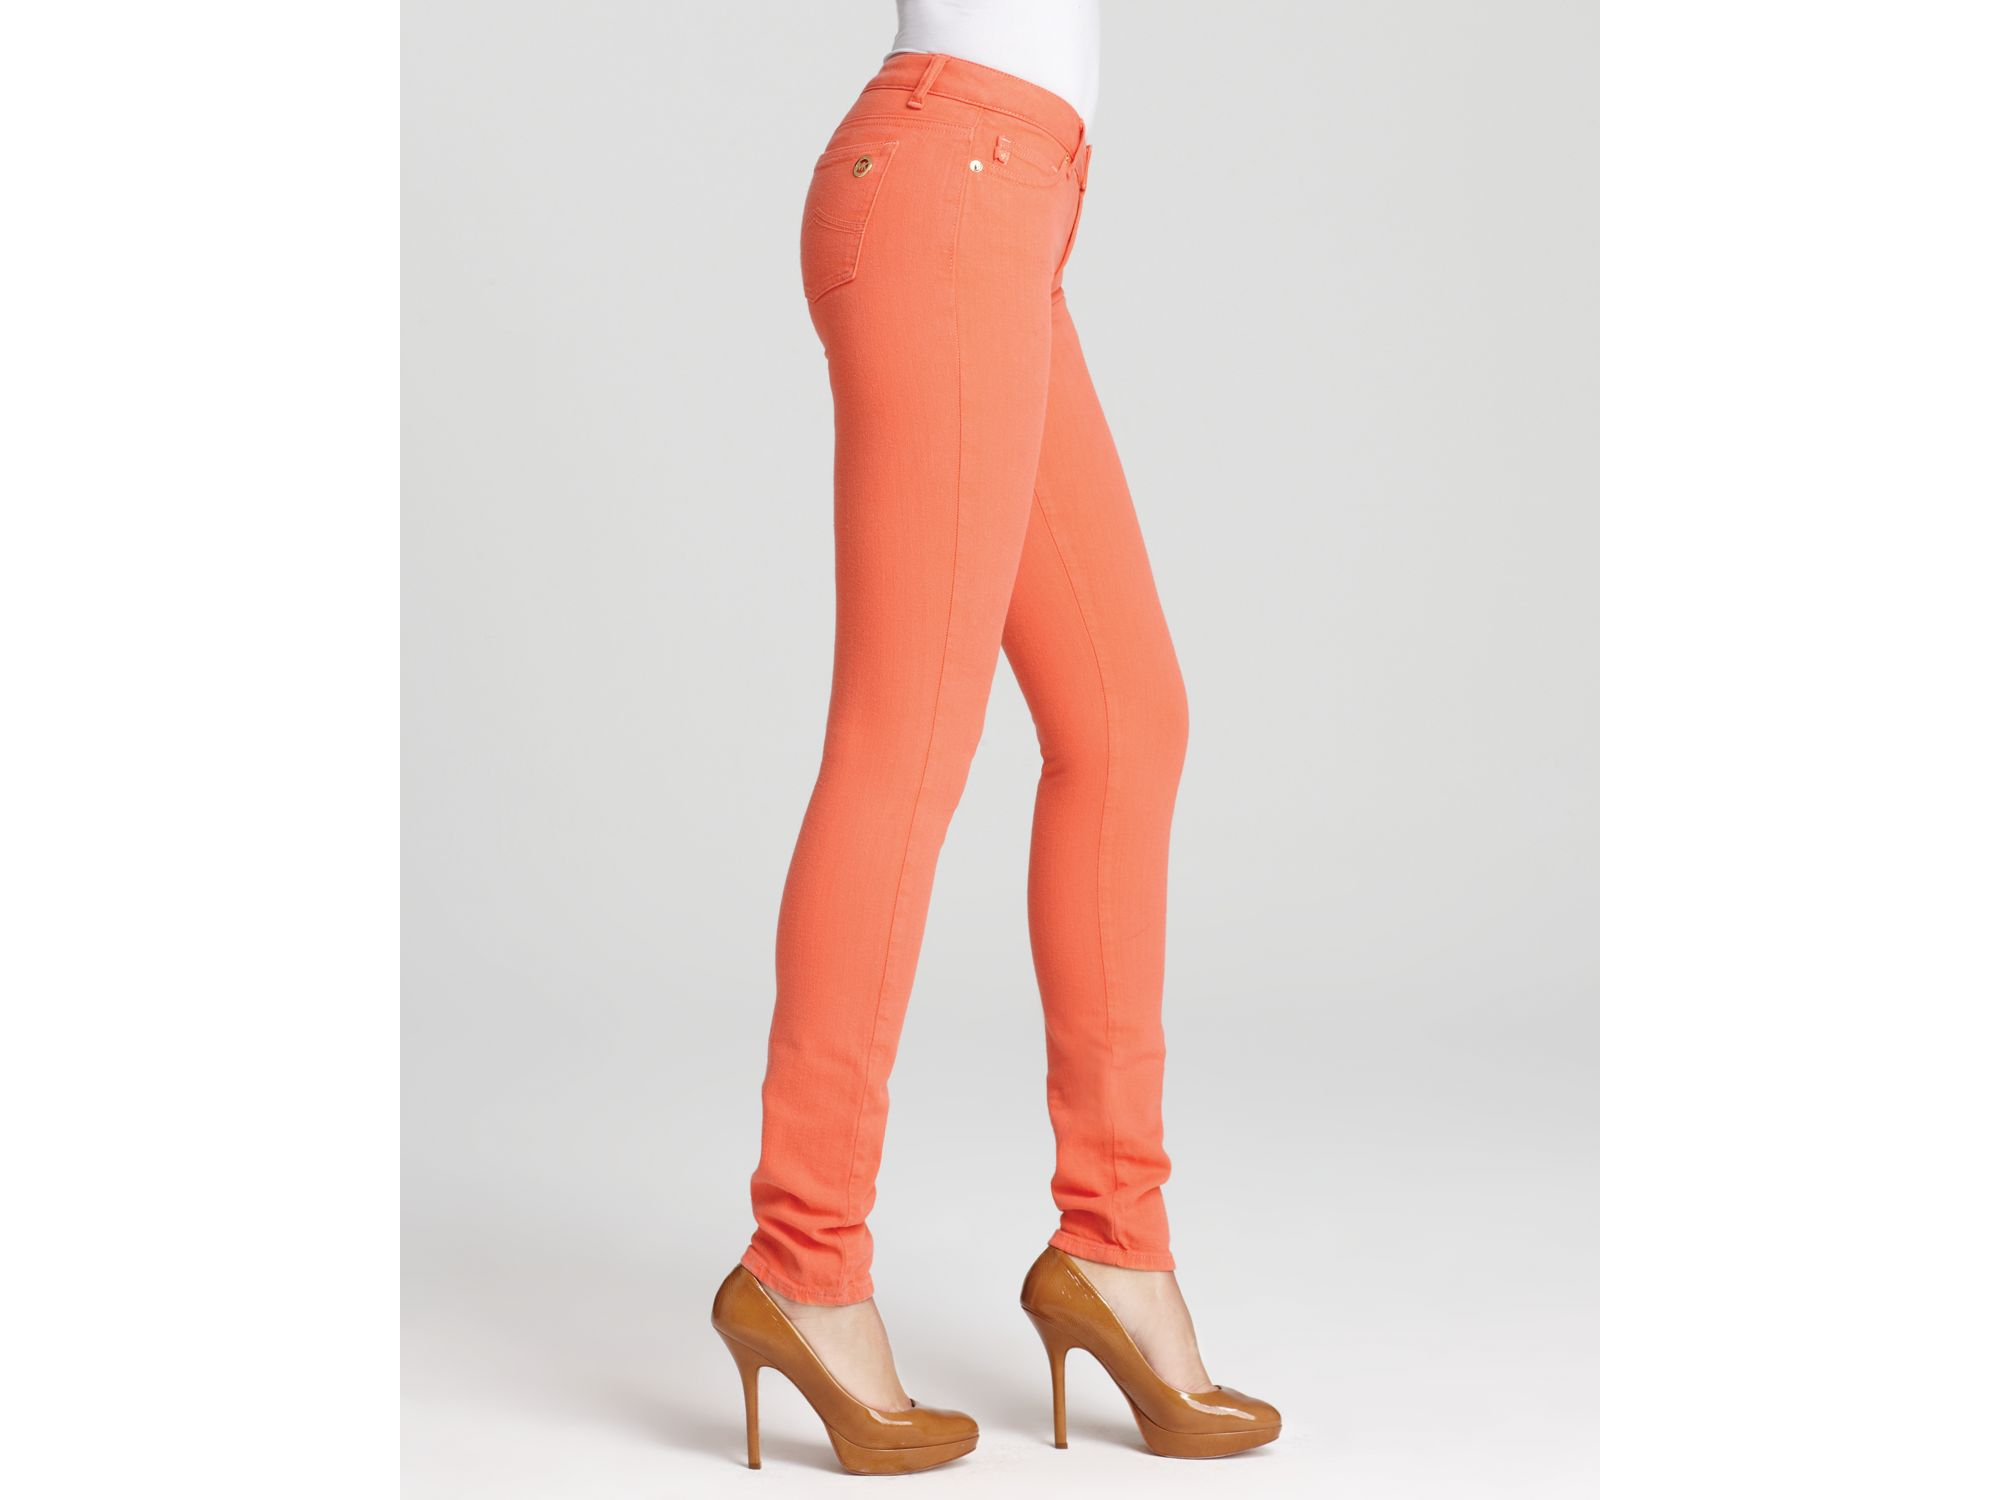 Michael michael kors Jewels Colored Skinny Jeans in Orange | Lyst